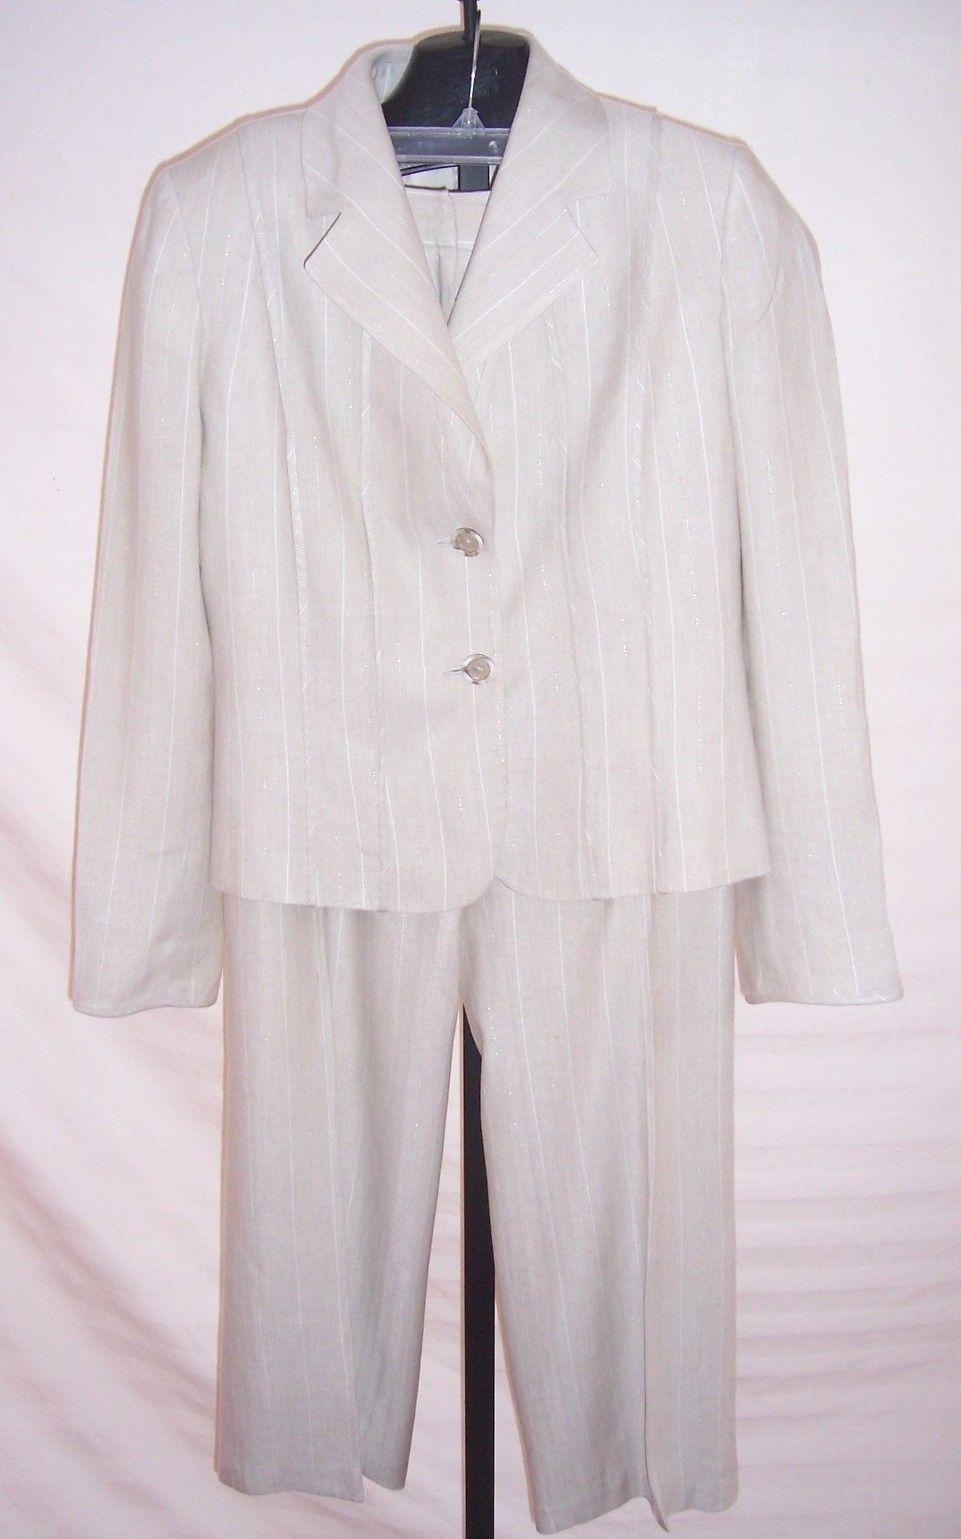 b4a5c0c5b74f0 Tahari Beige Pin Striped Cotton blend Pant and 50 similar items